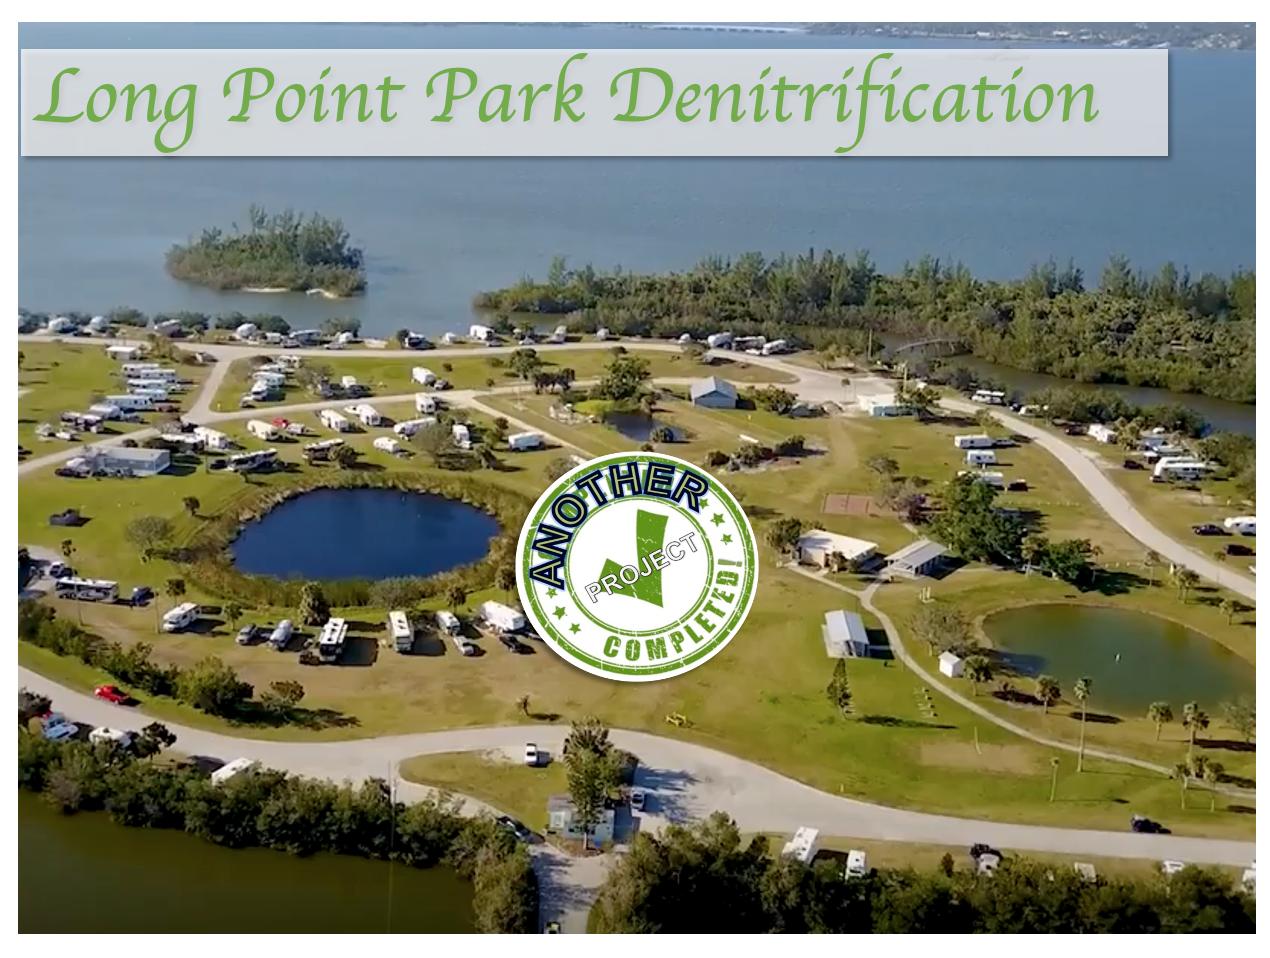 Long Point Park Denitrification 1